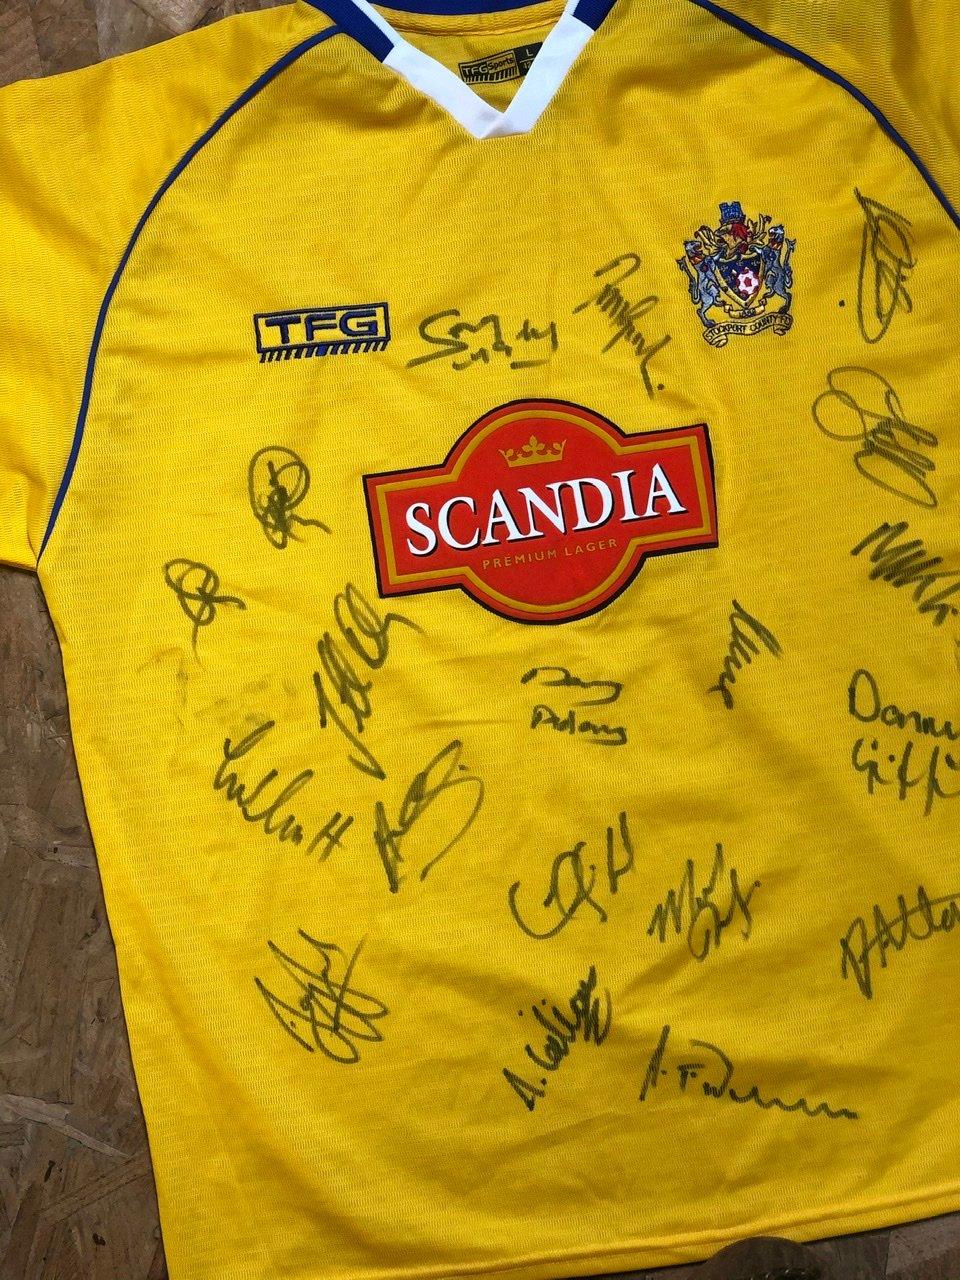 Image of Replica 2003/04 signed TFG Away Shirt